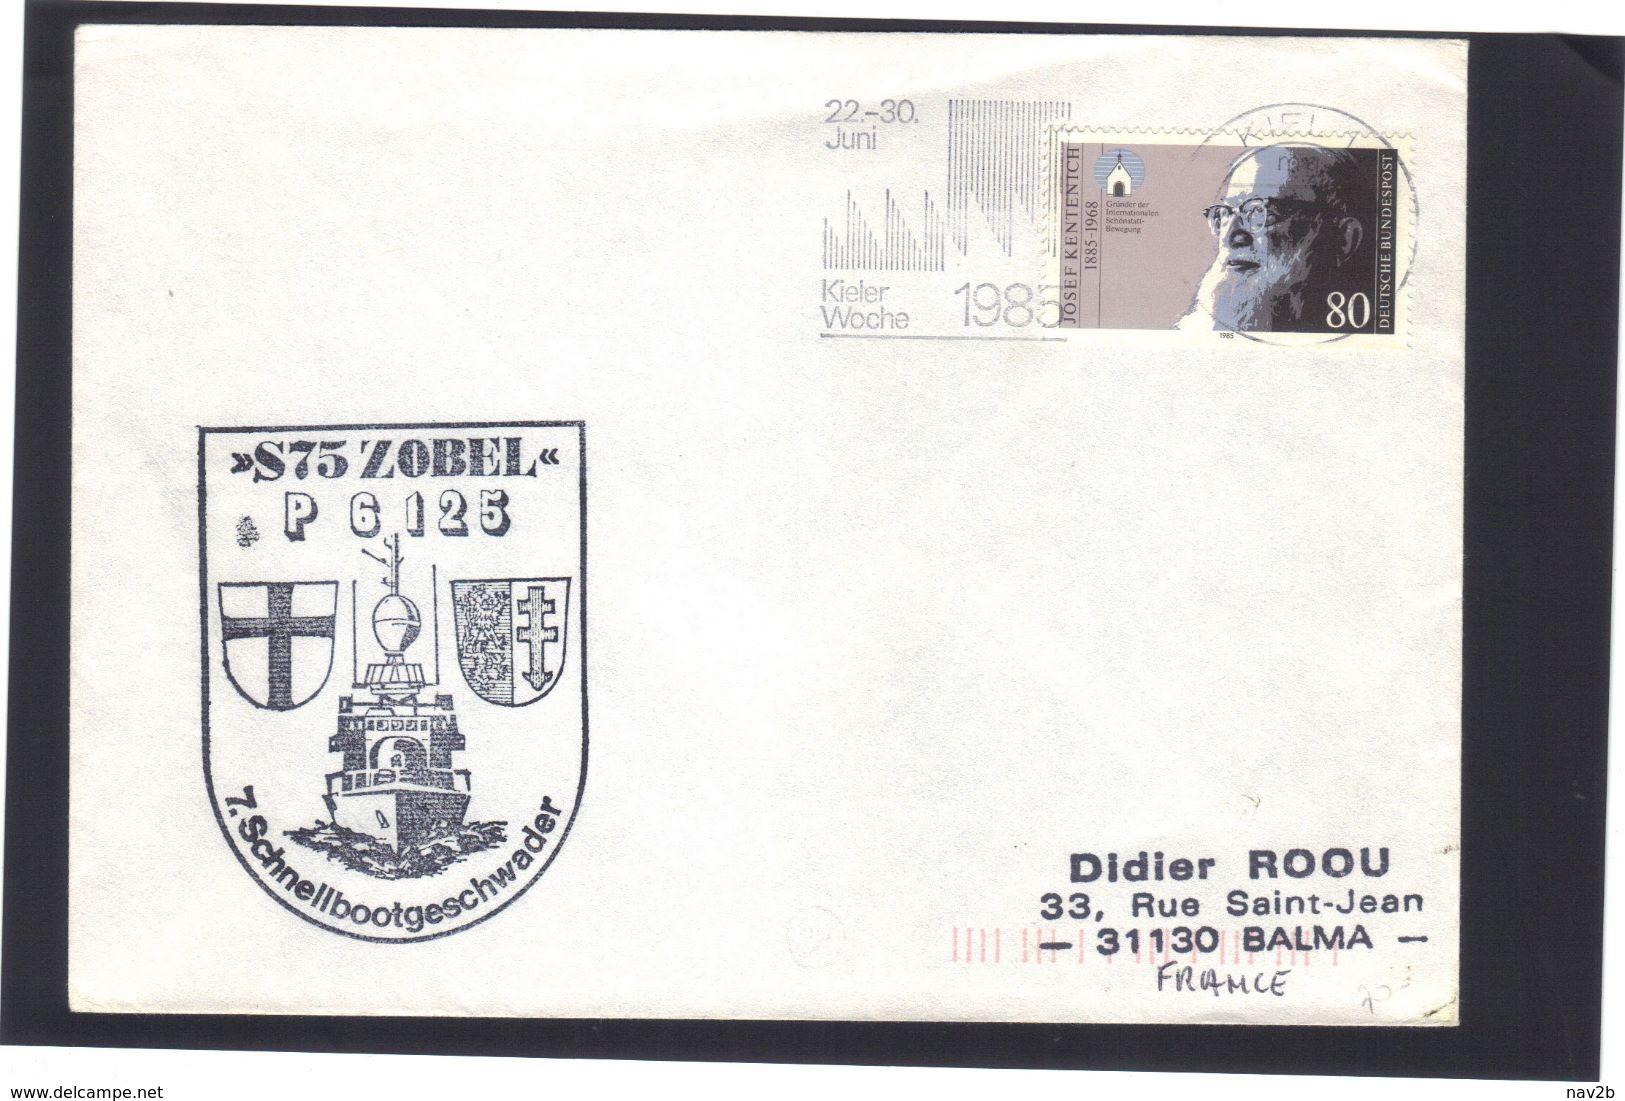 POSTE  NAVALE  .    S75  ZOBEL .   P6125 .  1985 . - [7] Federal Republic